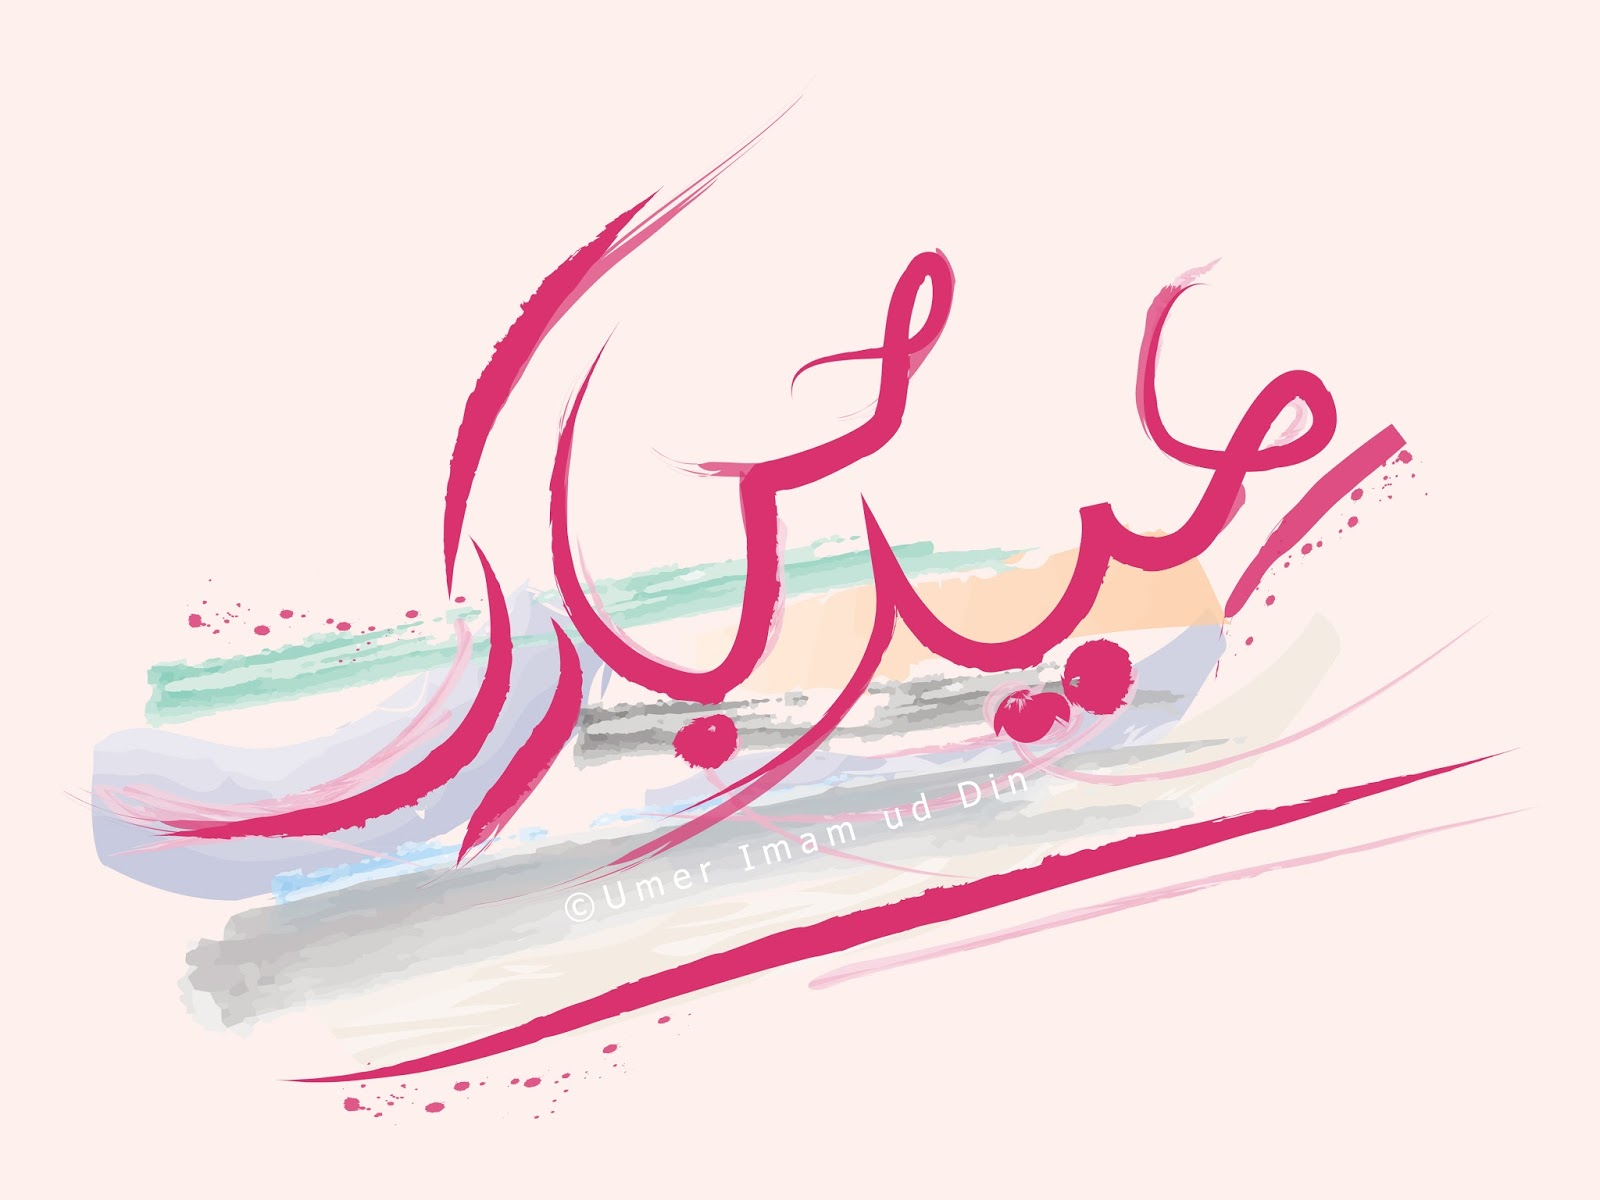 بالصور اجمل صور للعيد , صور تهنئه للعيد جميله 4471 5